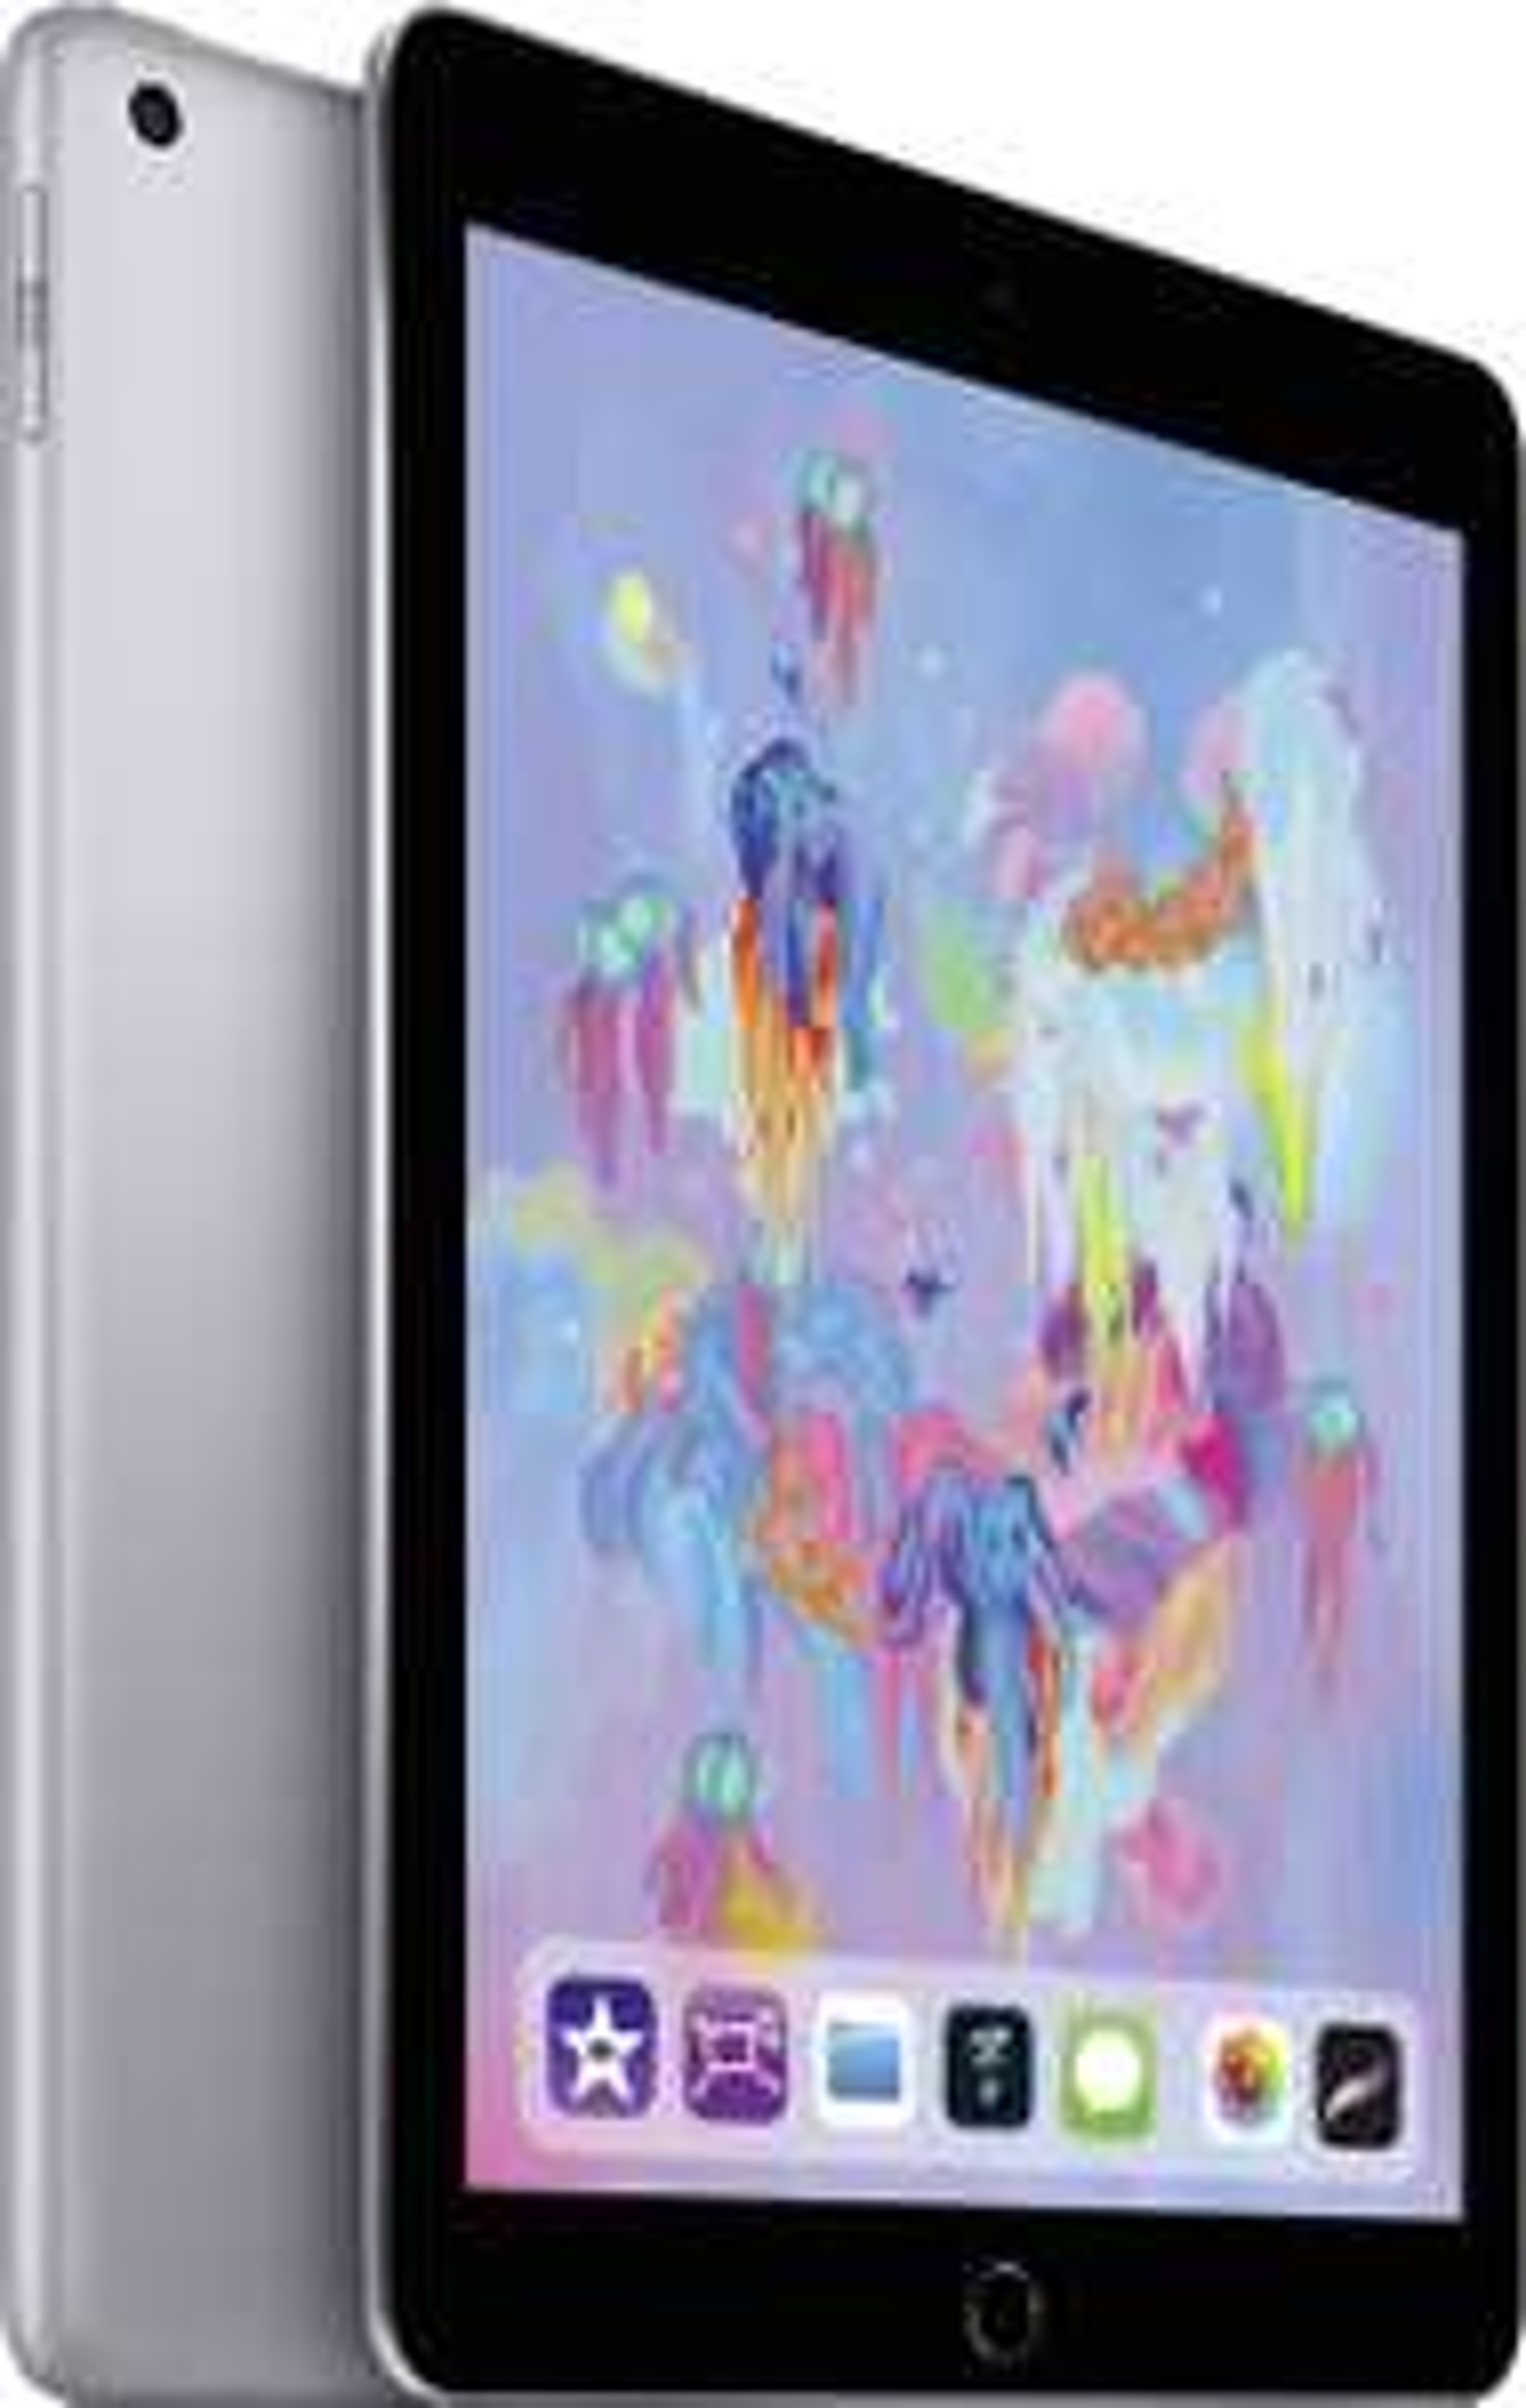 Apple iPad 2018 32GB WiFi sofort verfügbar bei Digitalo